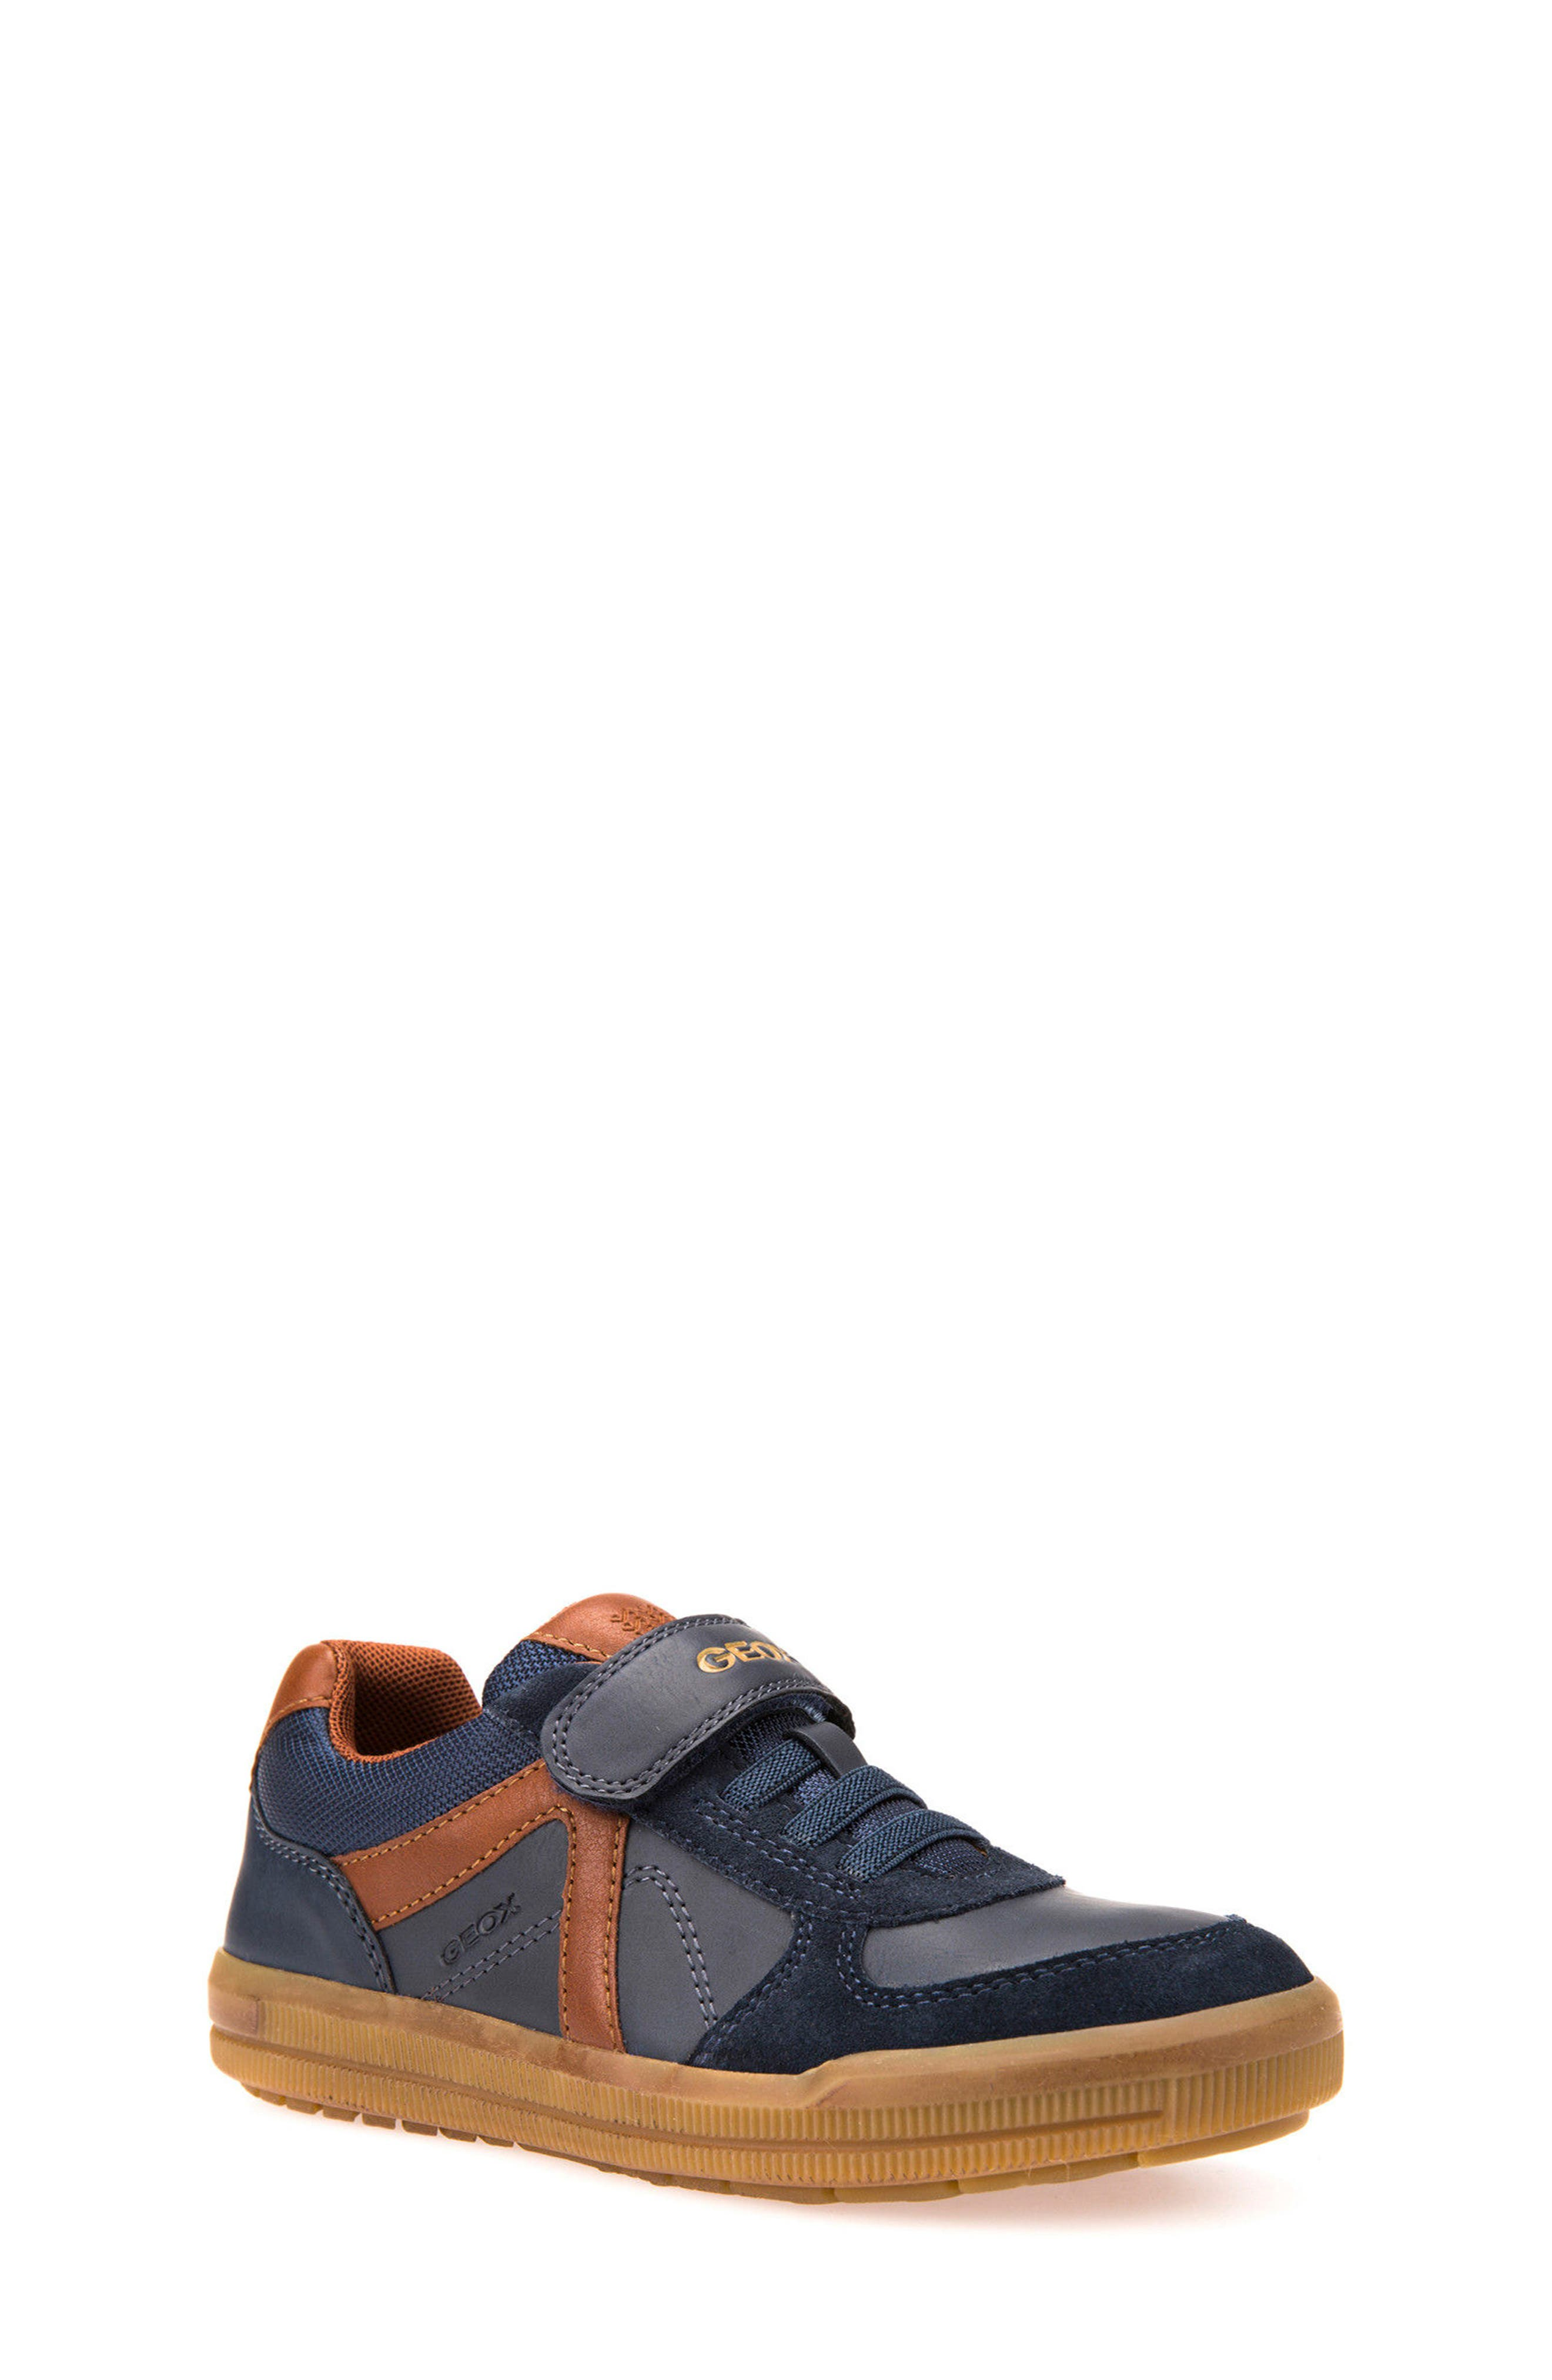 Main Image - Geox Arzach Low Top Sneaker (Toddler, Little Kid & Big Kid)